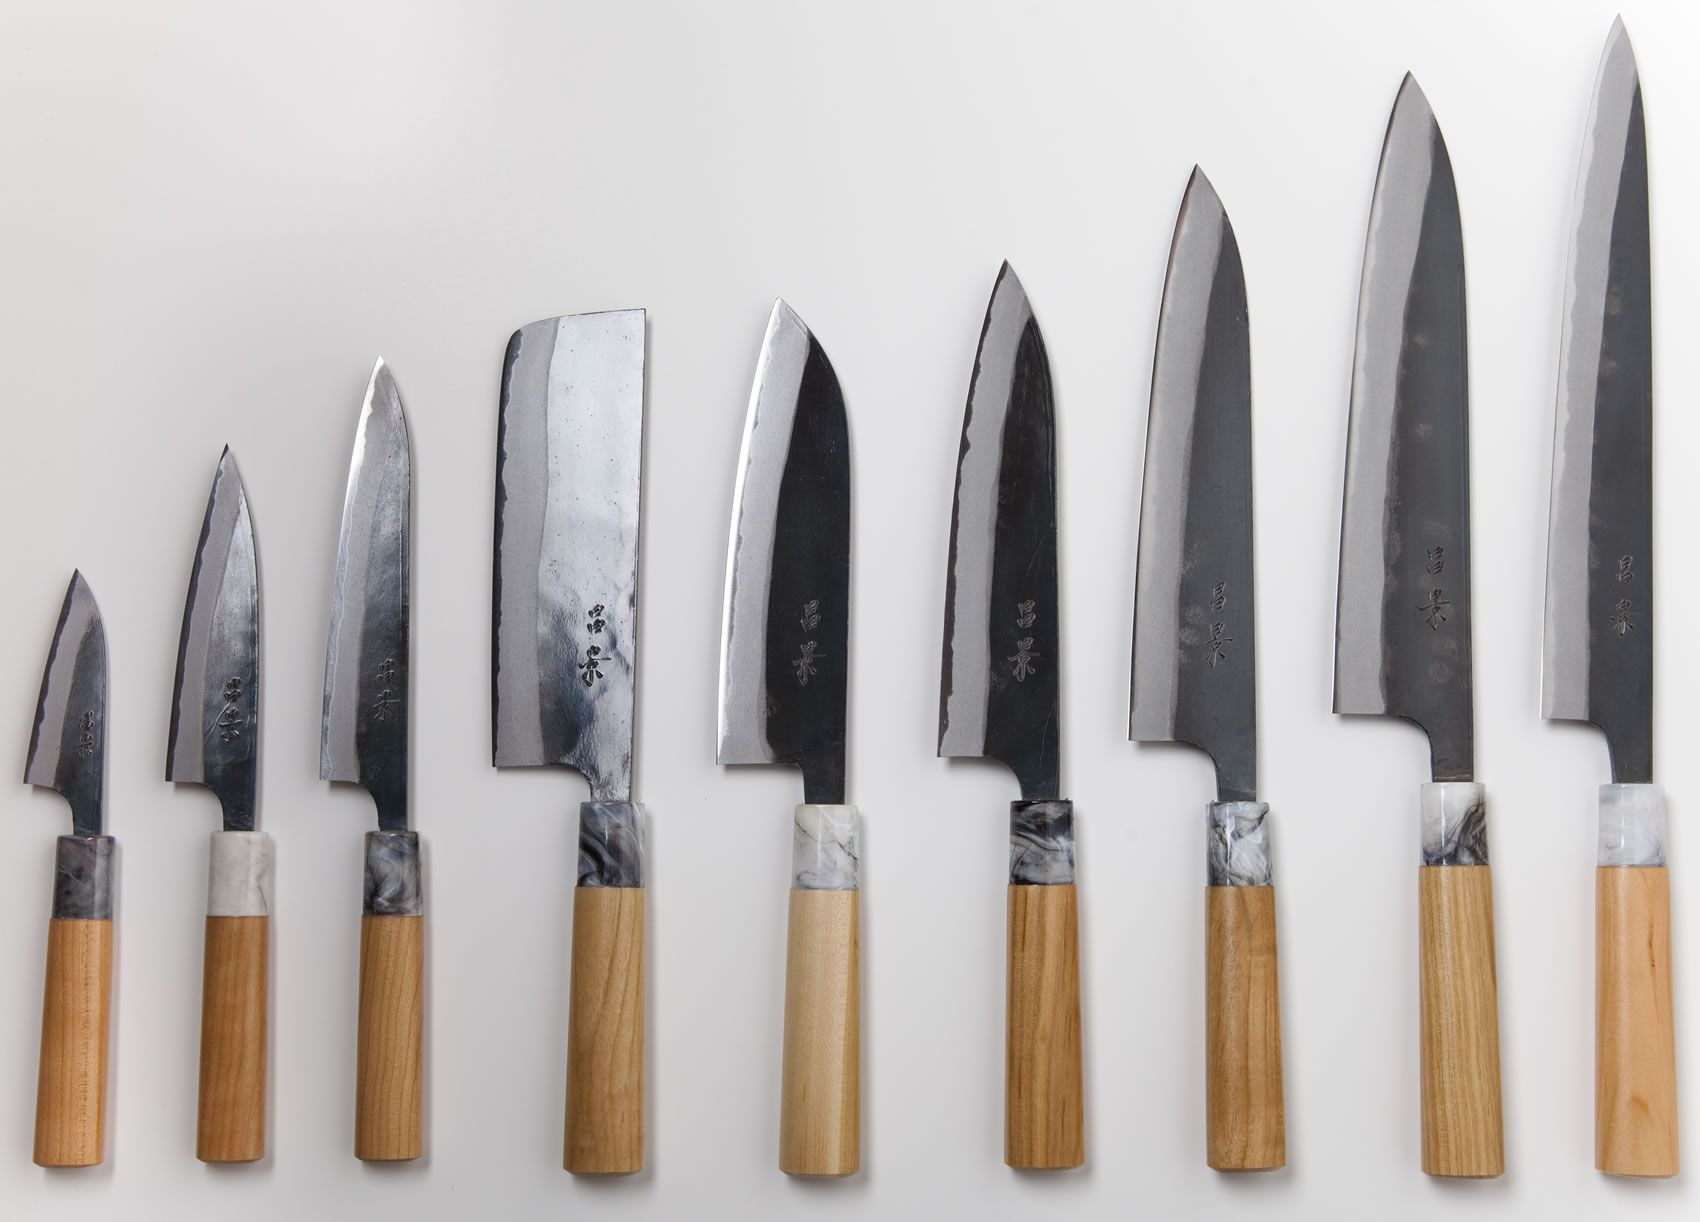 Masakage Mizu Line By Katsushige Anryu Kitchen Knives Japanese Kitchen Knives Knife Shapes